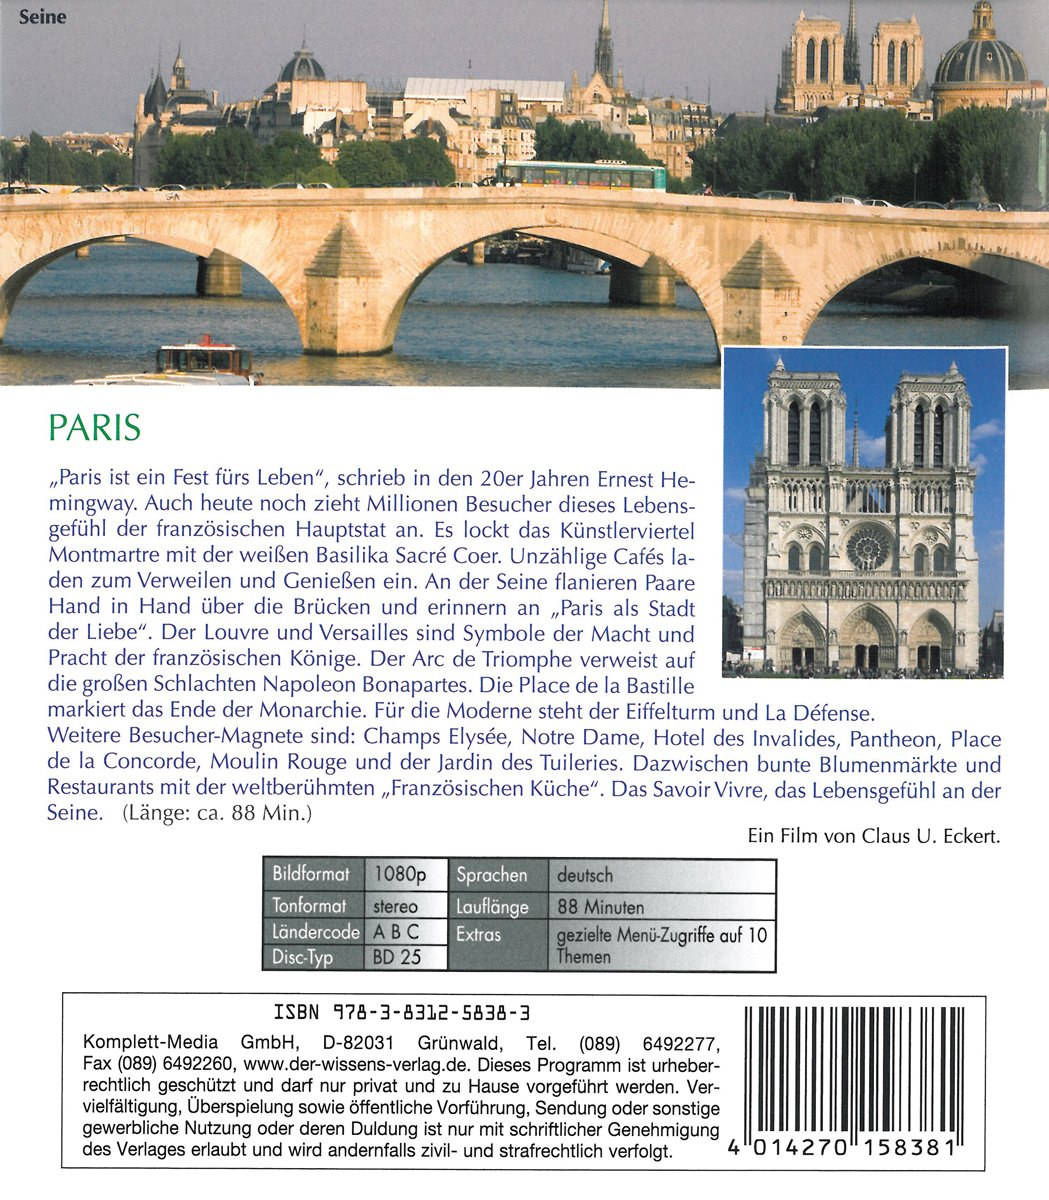 Amazon.com: Paris - Golden Globe: Movies & TV